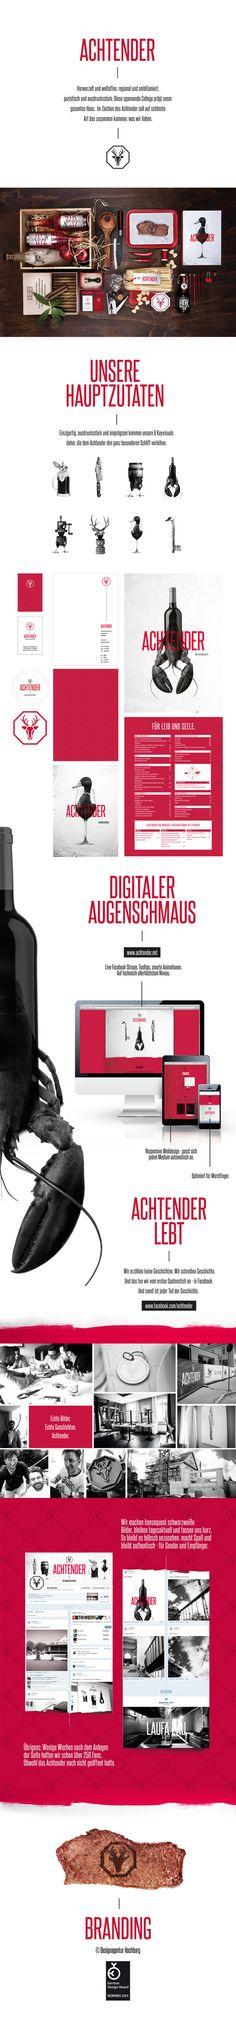 Achtender / Branding by HOCHBURG, via Behance